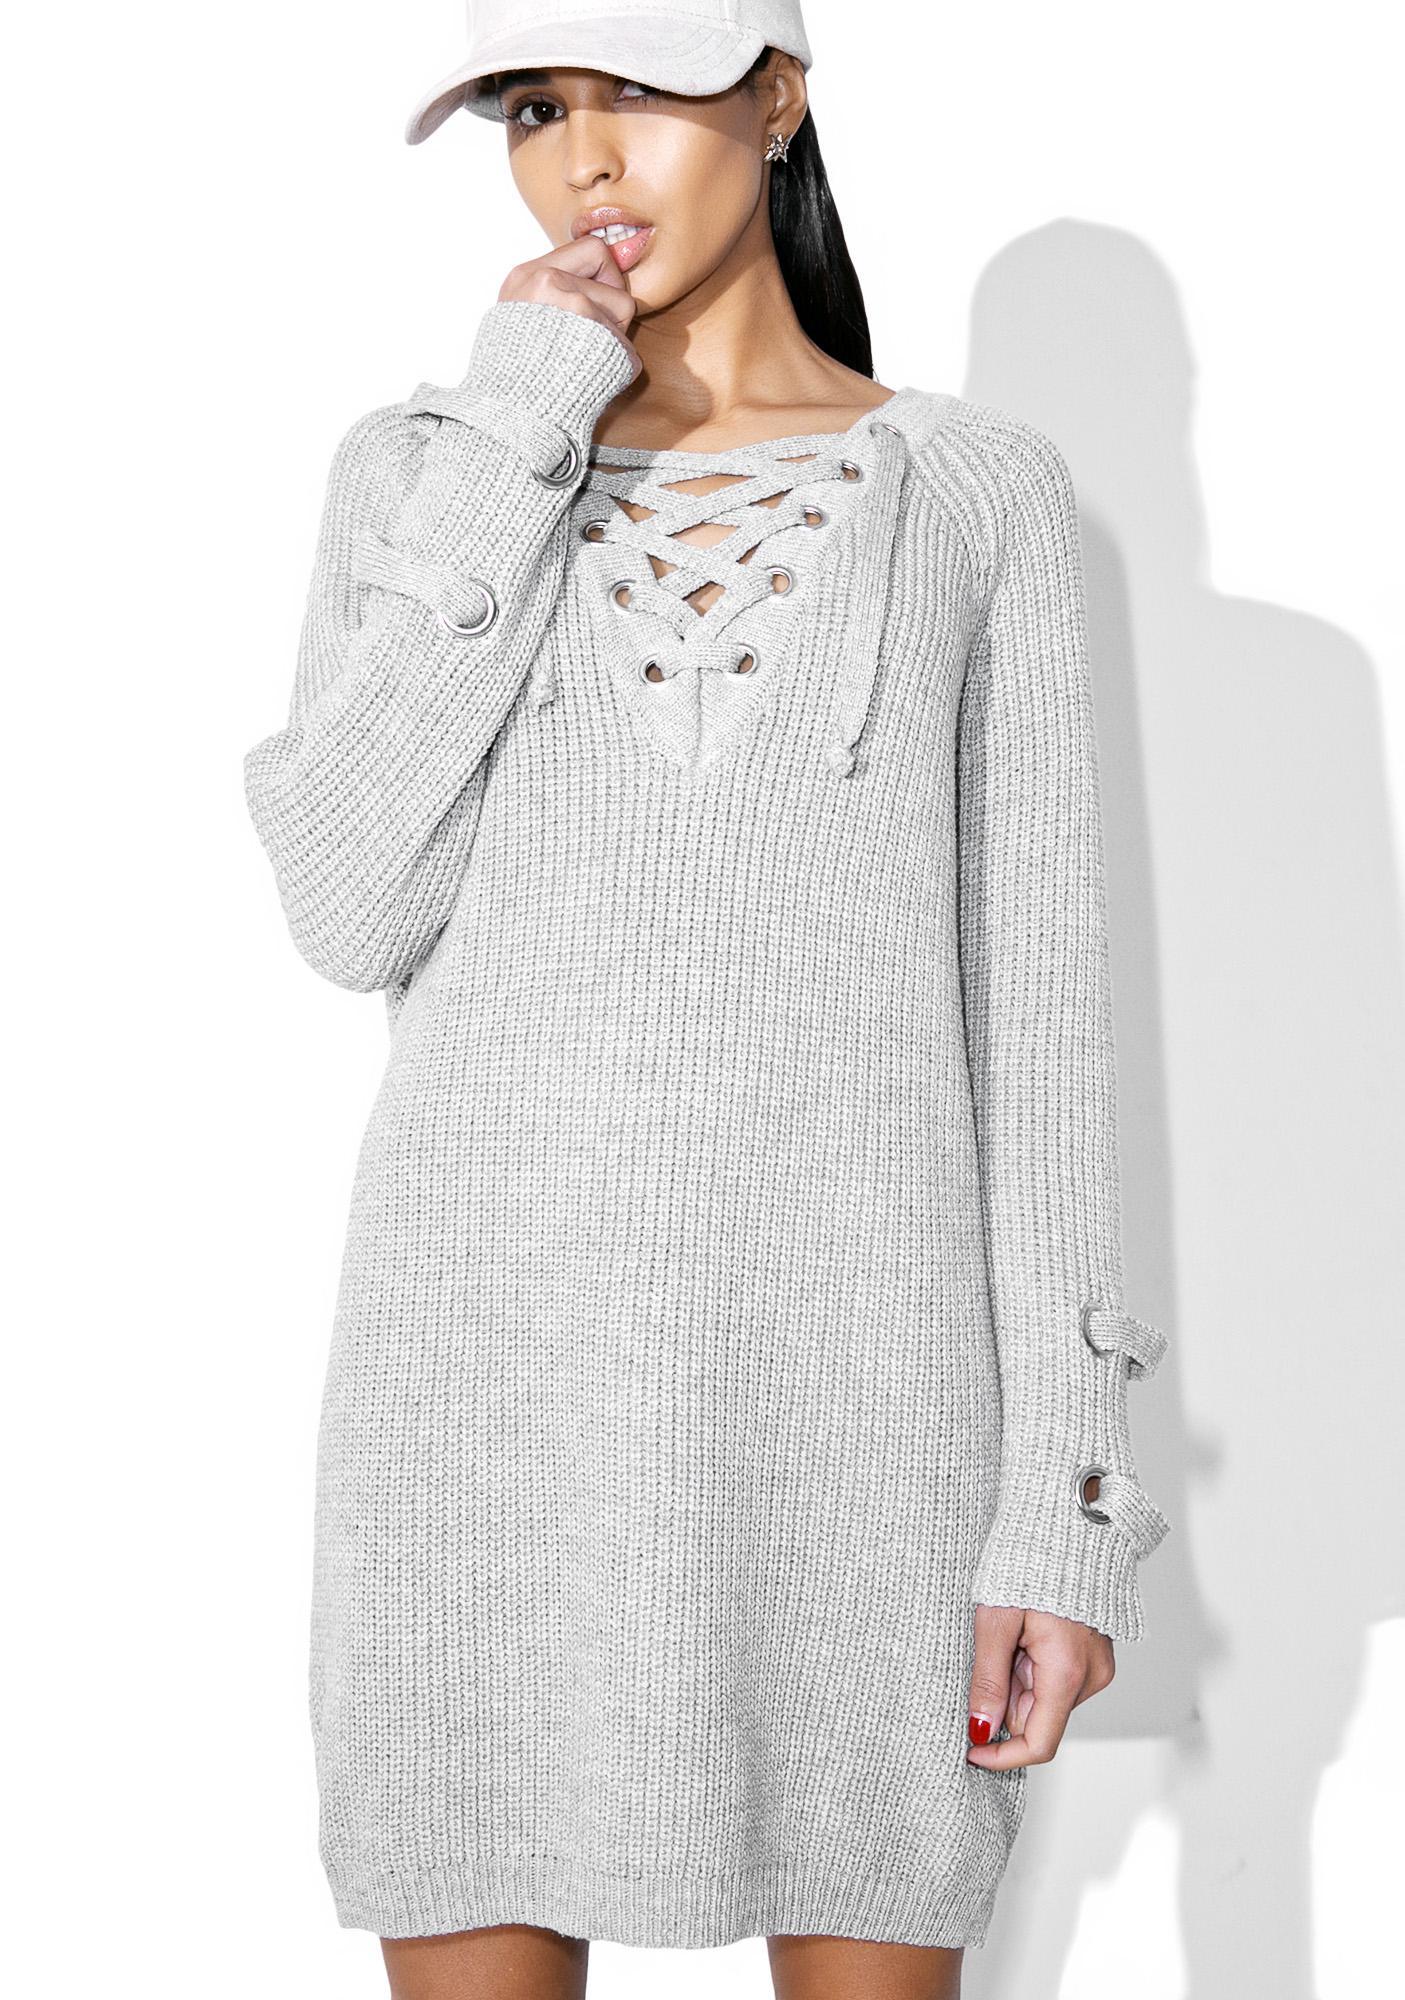 Yawning Sky Lace-Up Sweater